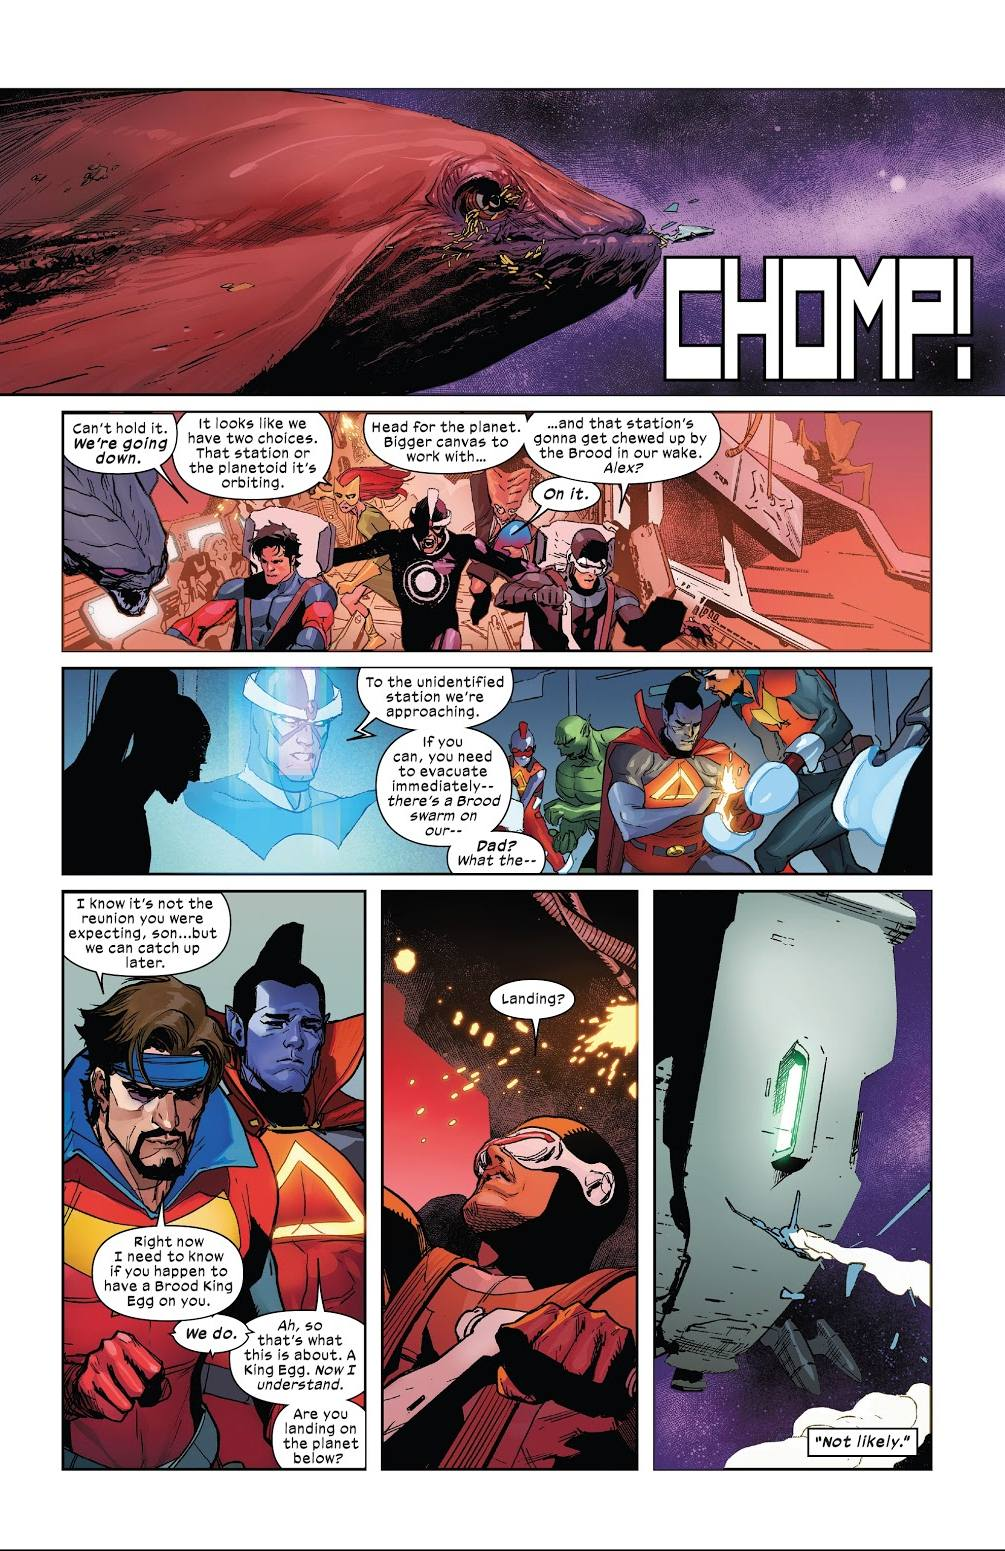 X-Men by Jonathan Hickman Vol. 2 review